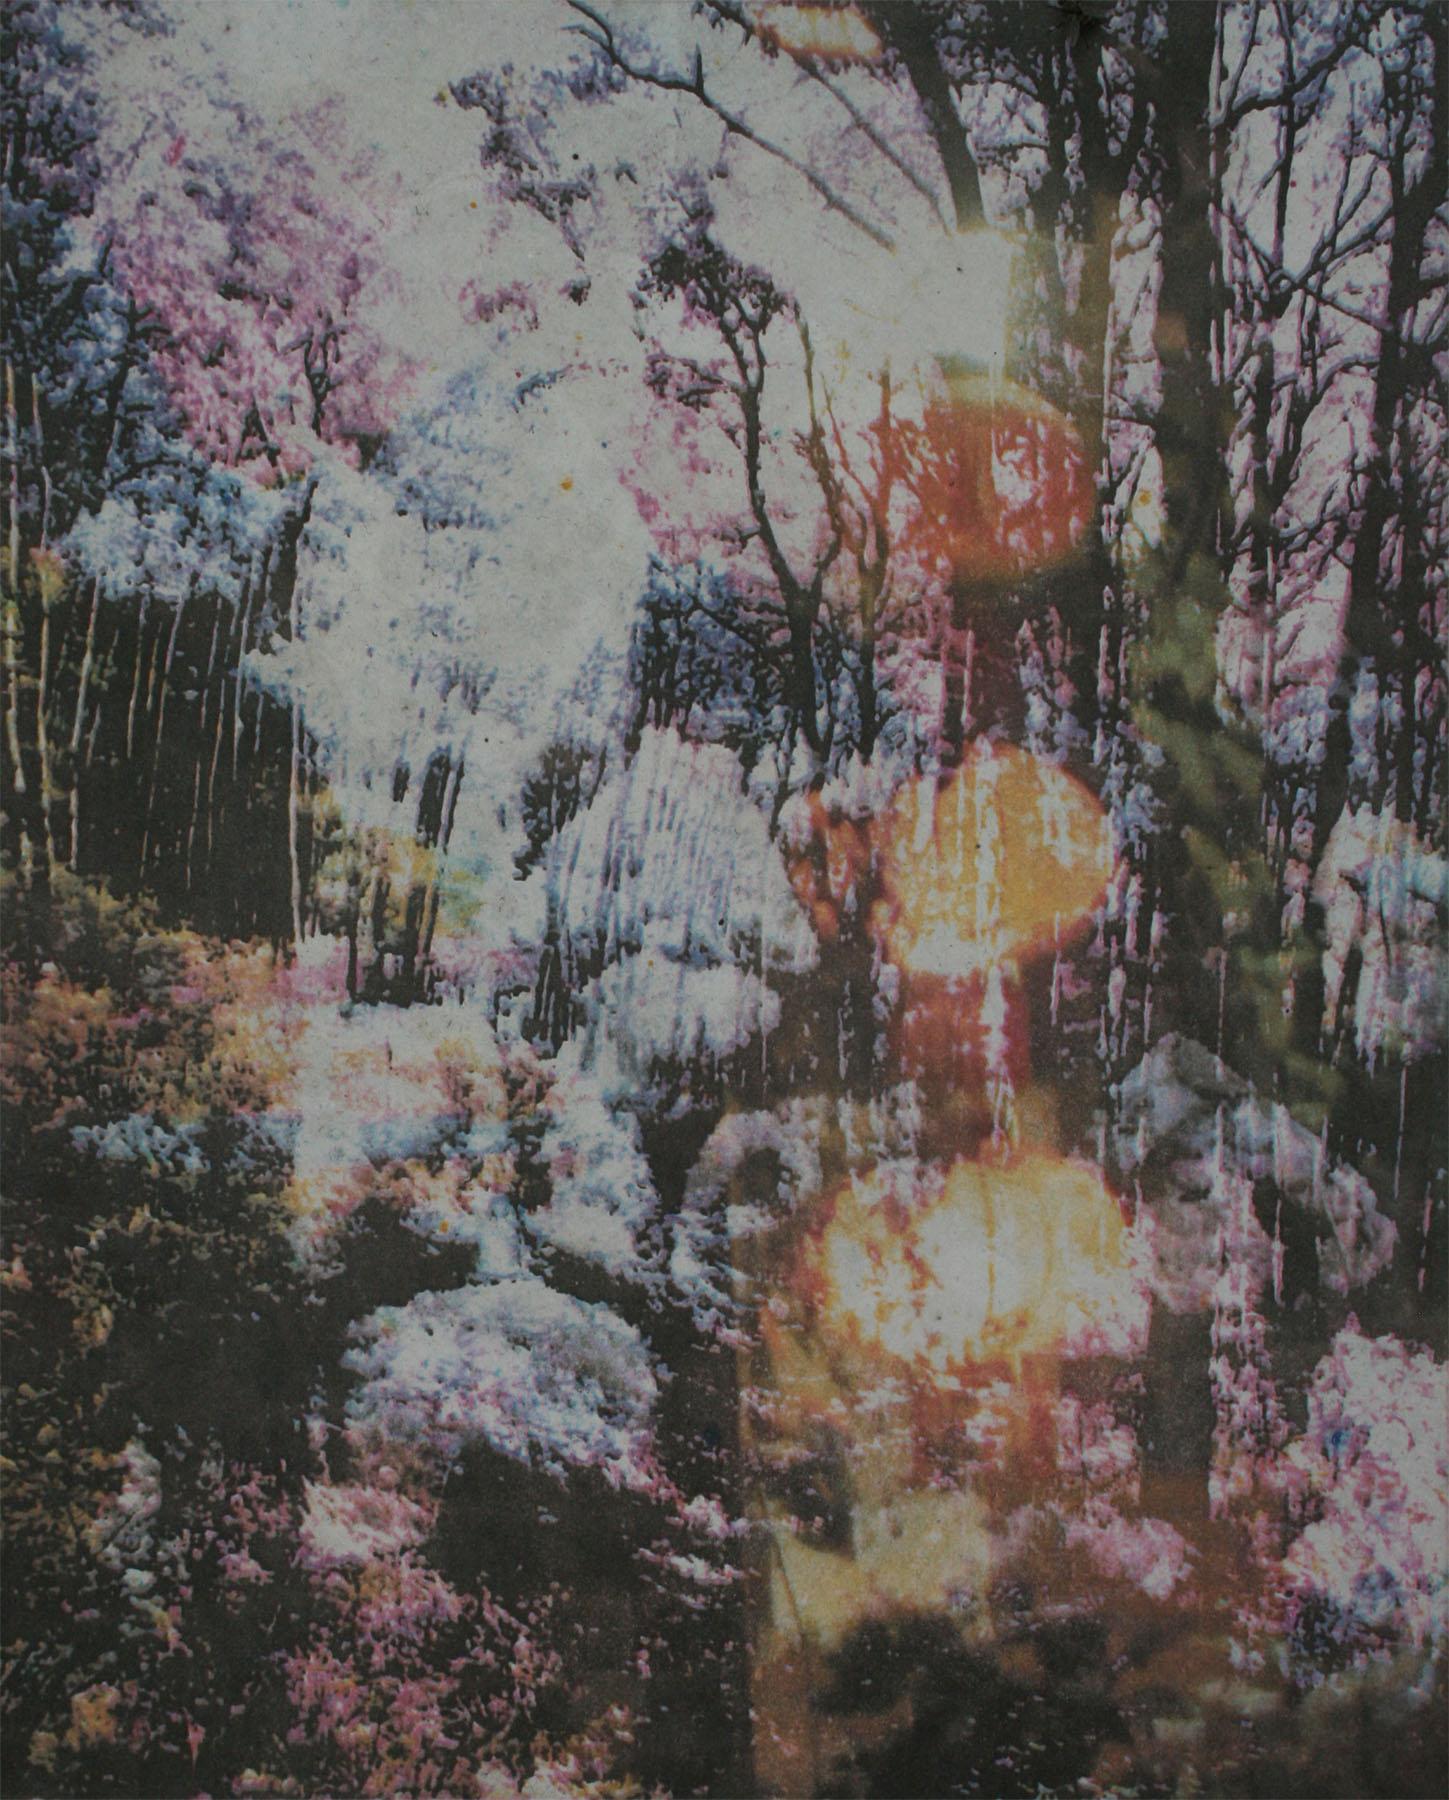 The Veil of Wildness, Jessica Weybright